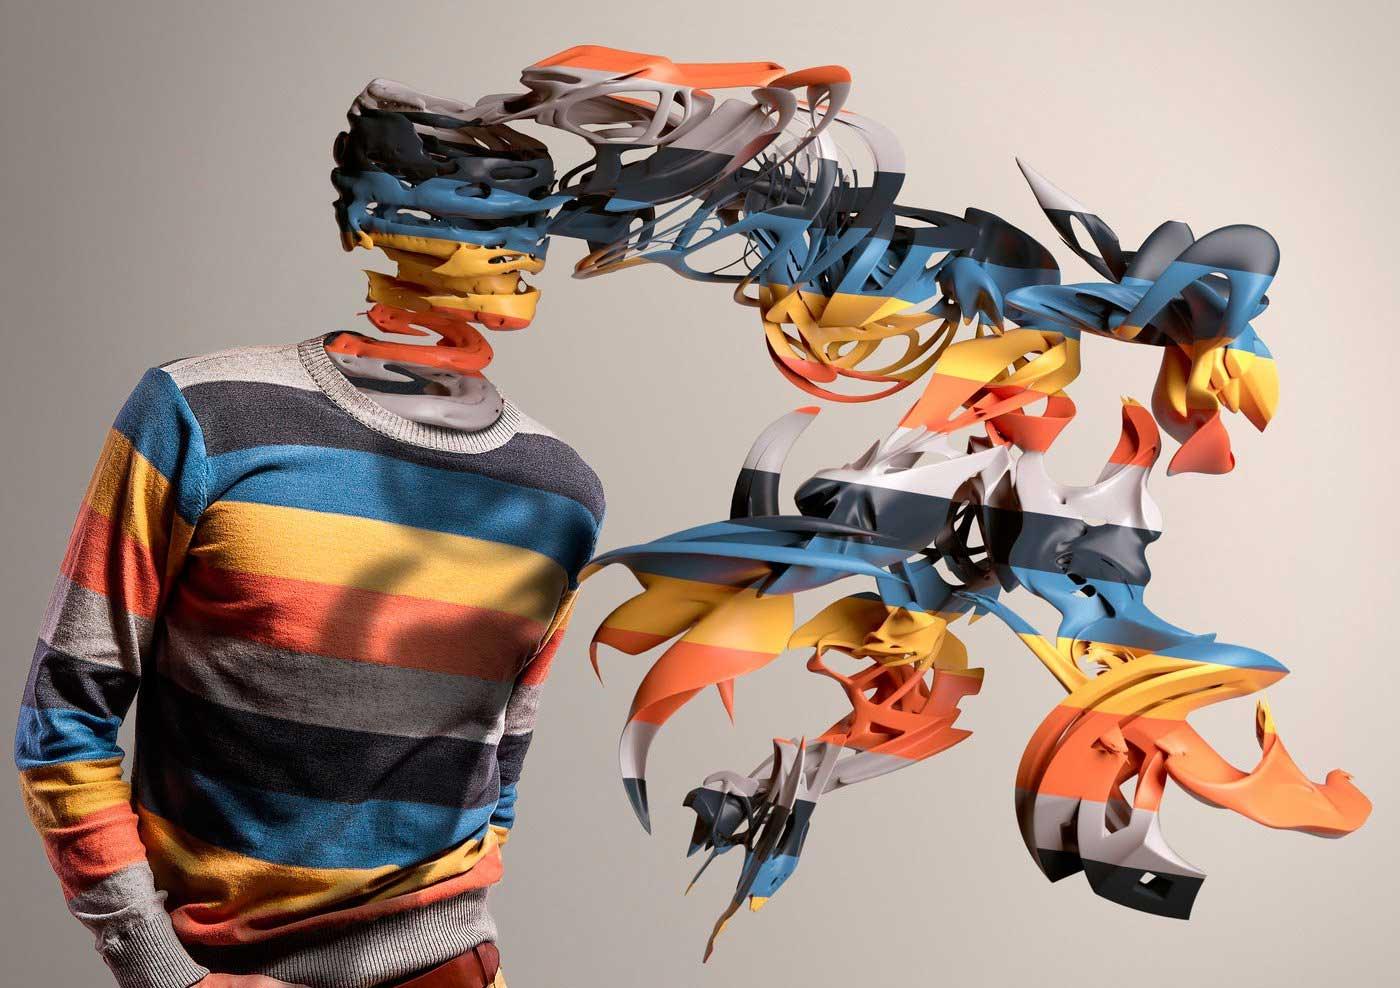 3D-CGI-Kunst von Sven Hauth CG-Sven-Hauth_04